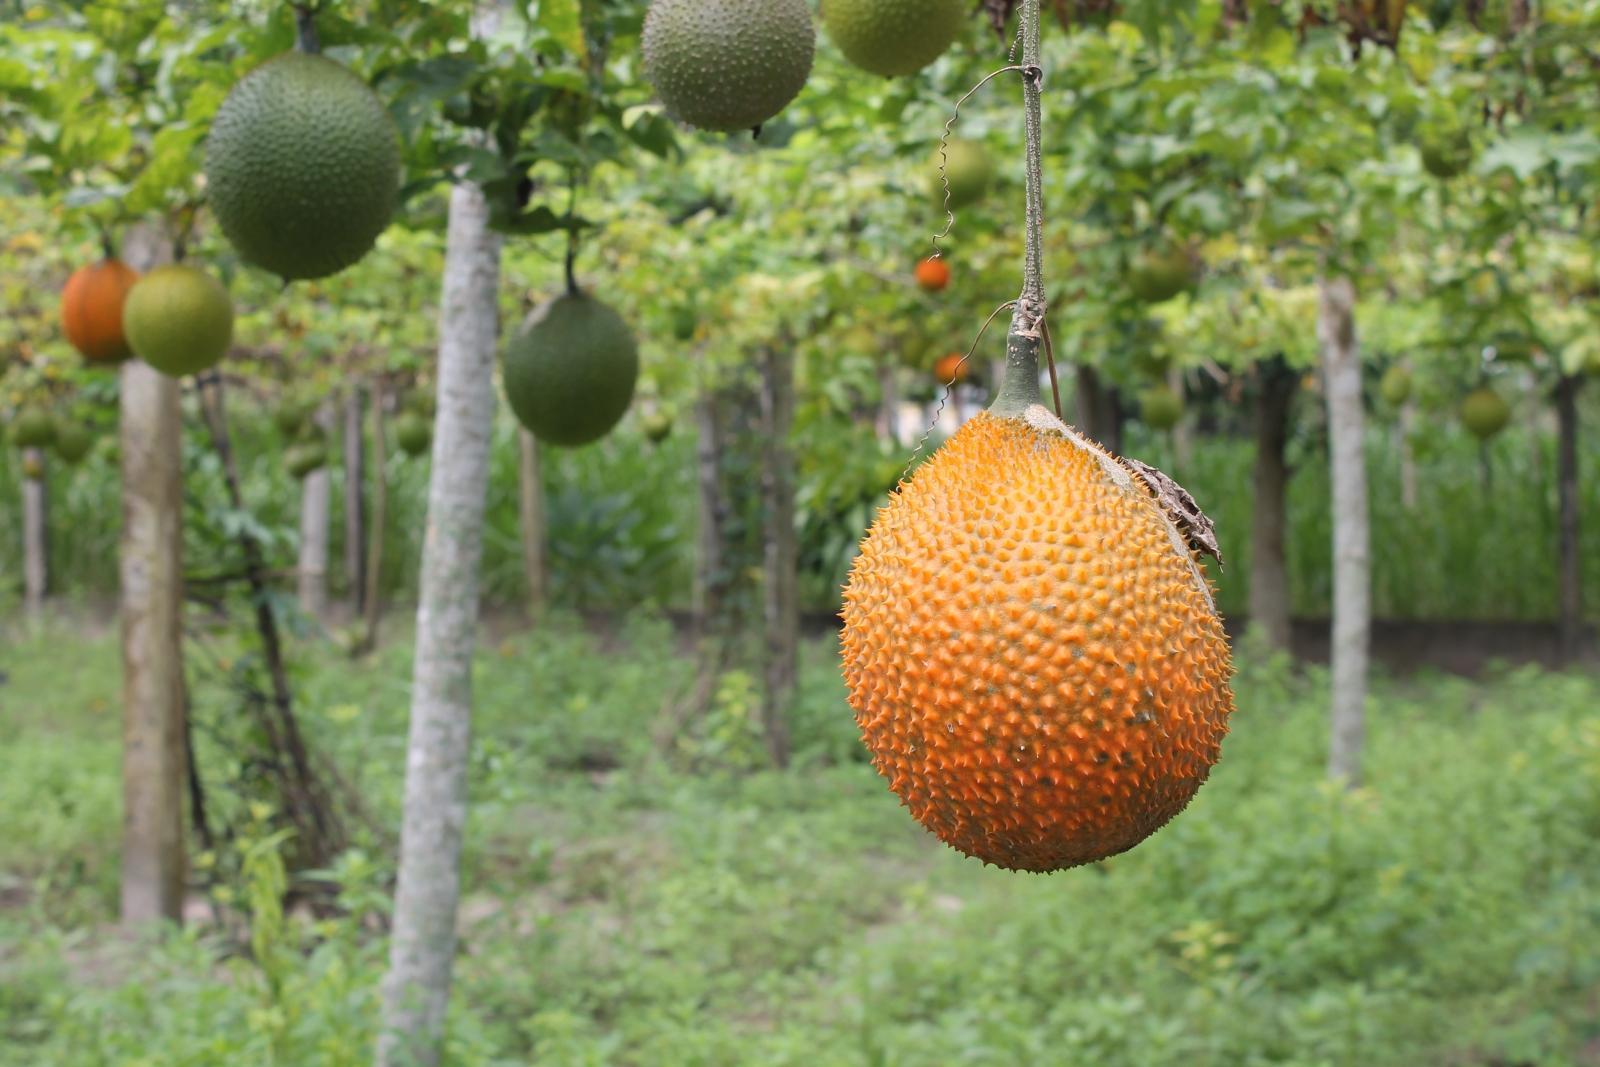 The Dish: Brown Grads Blend Vietnamese Gac Fruit into X O I